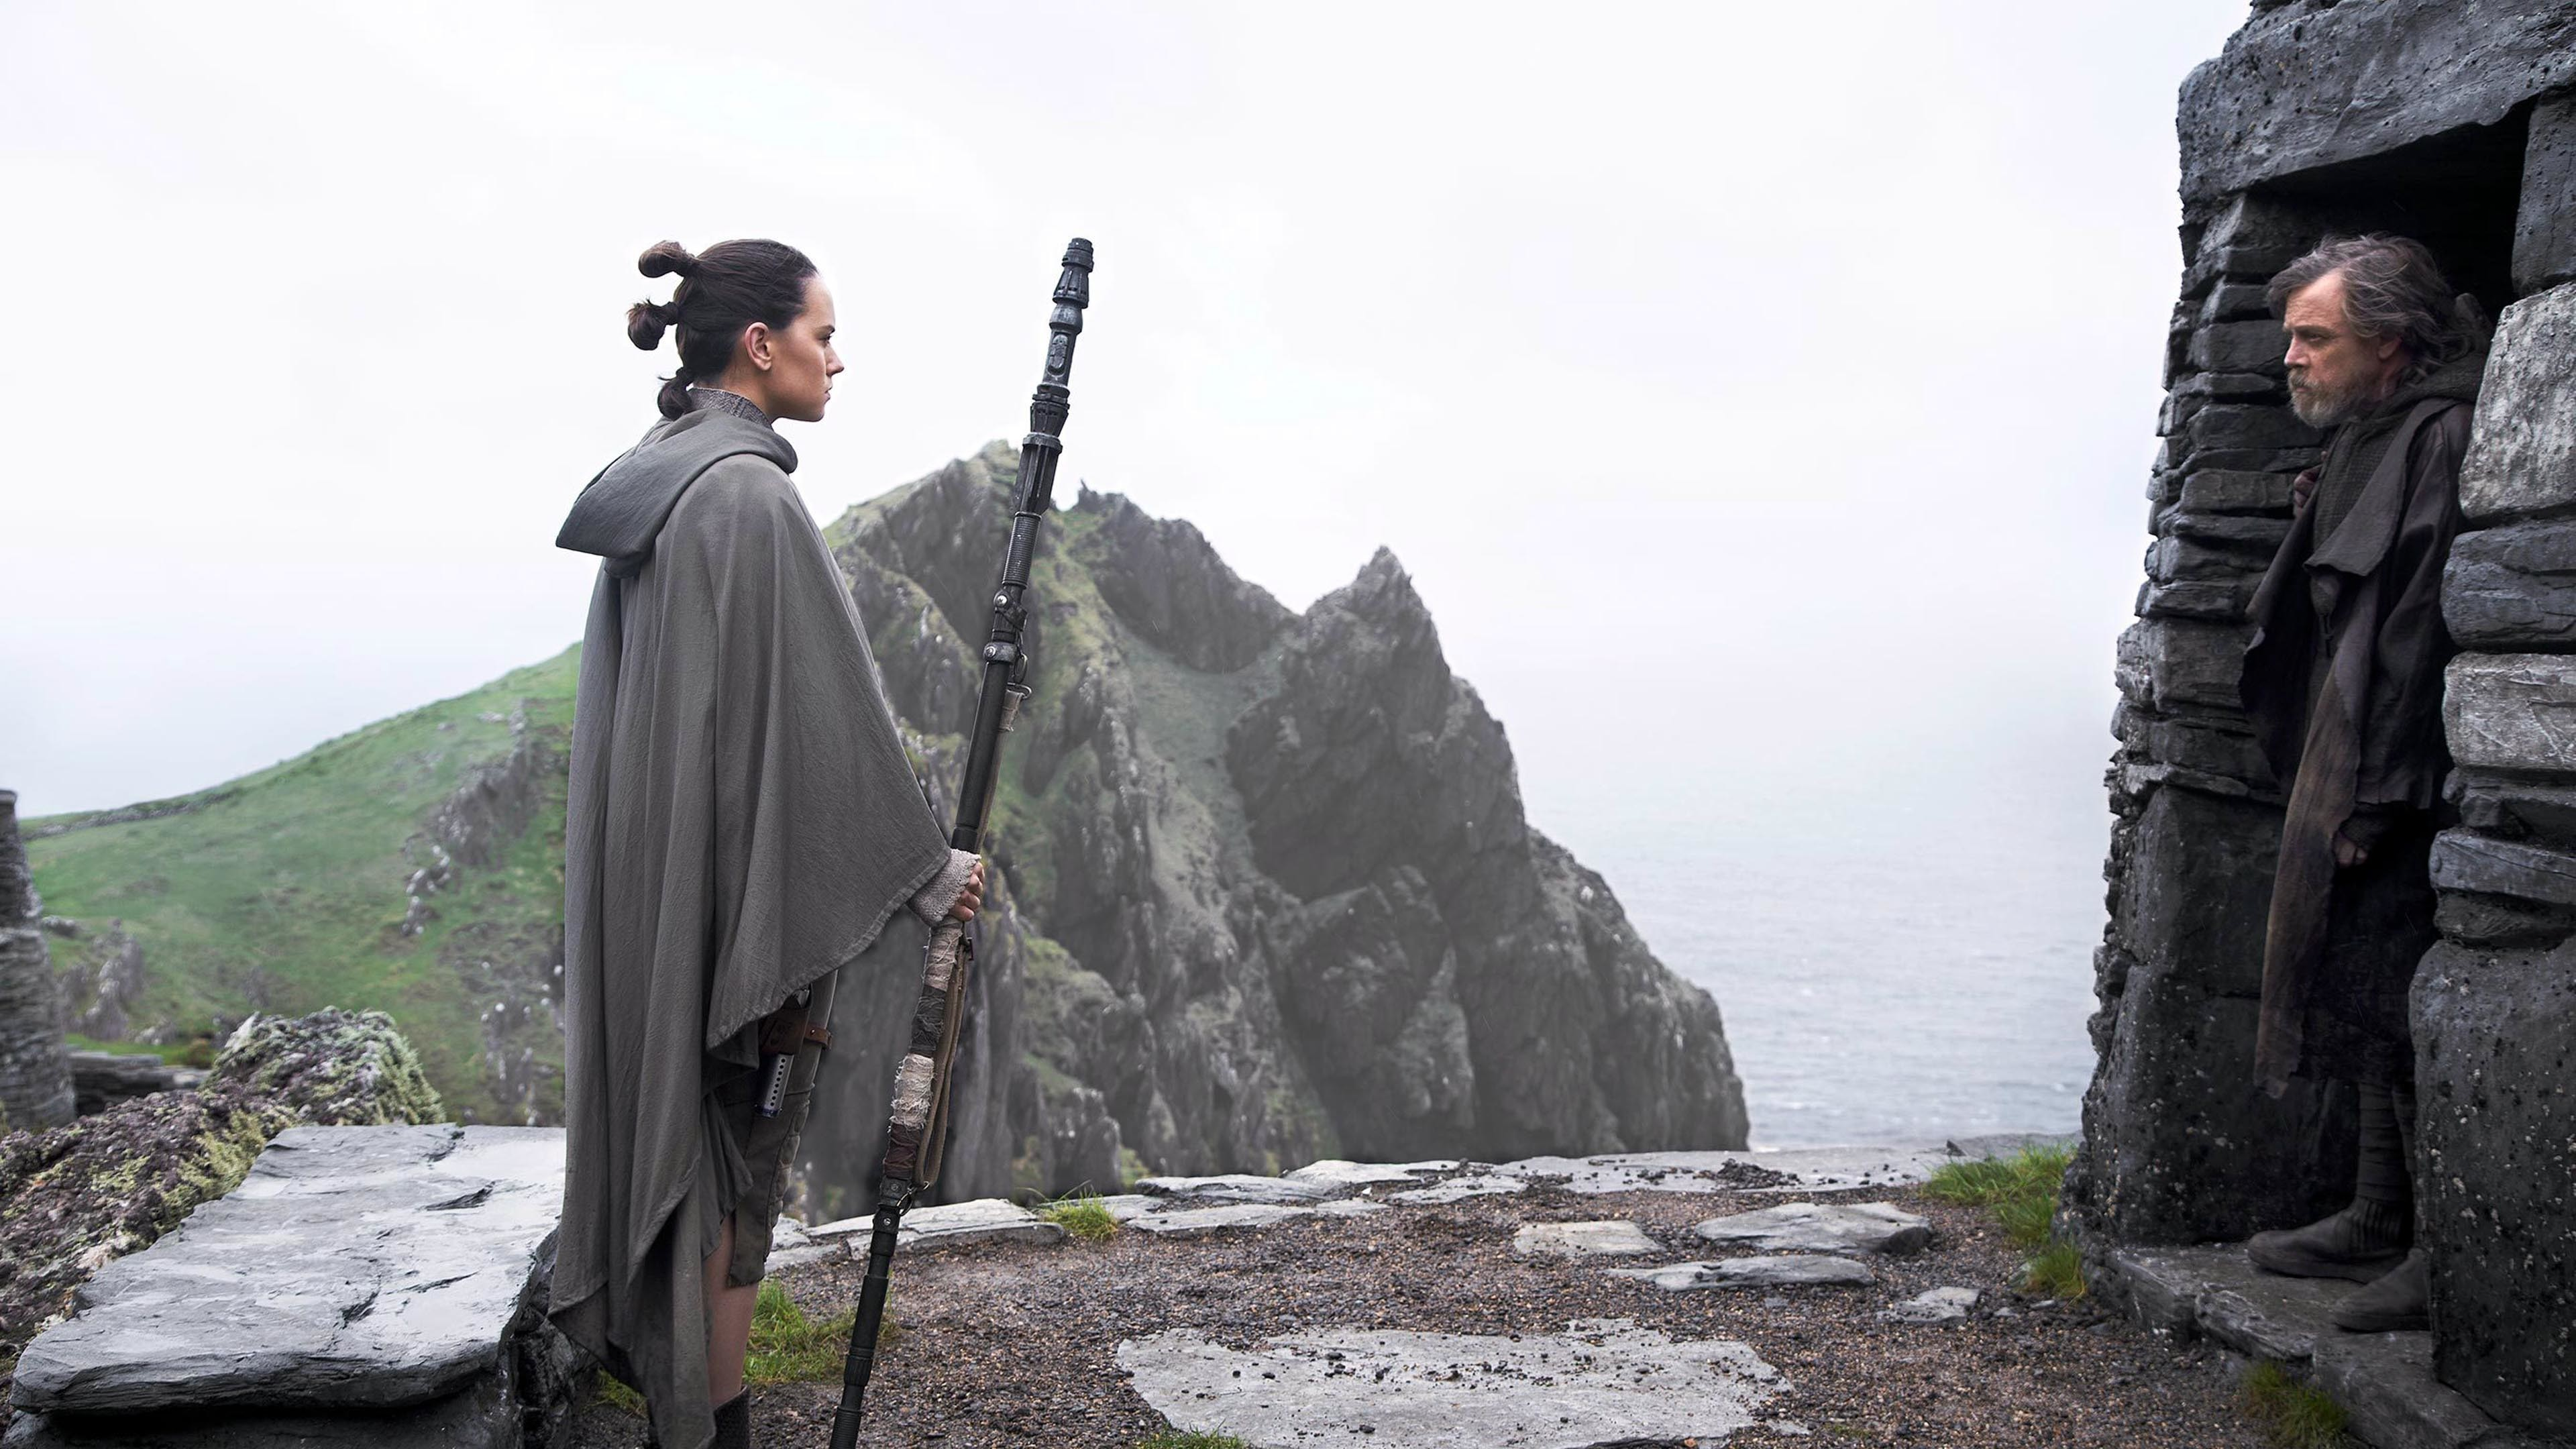 Rey (Daisy Ridley) and Luke Skywalker (Mark Hamill) – Star Wars: